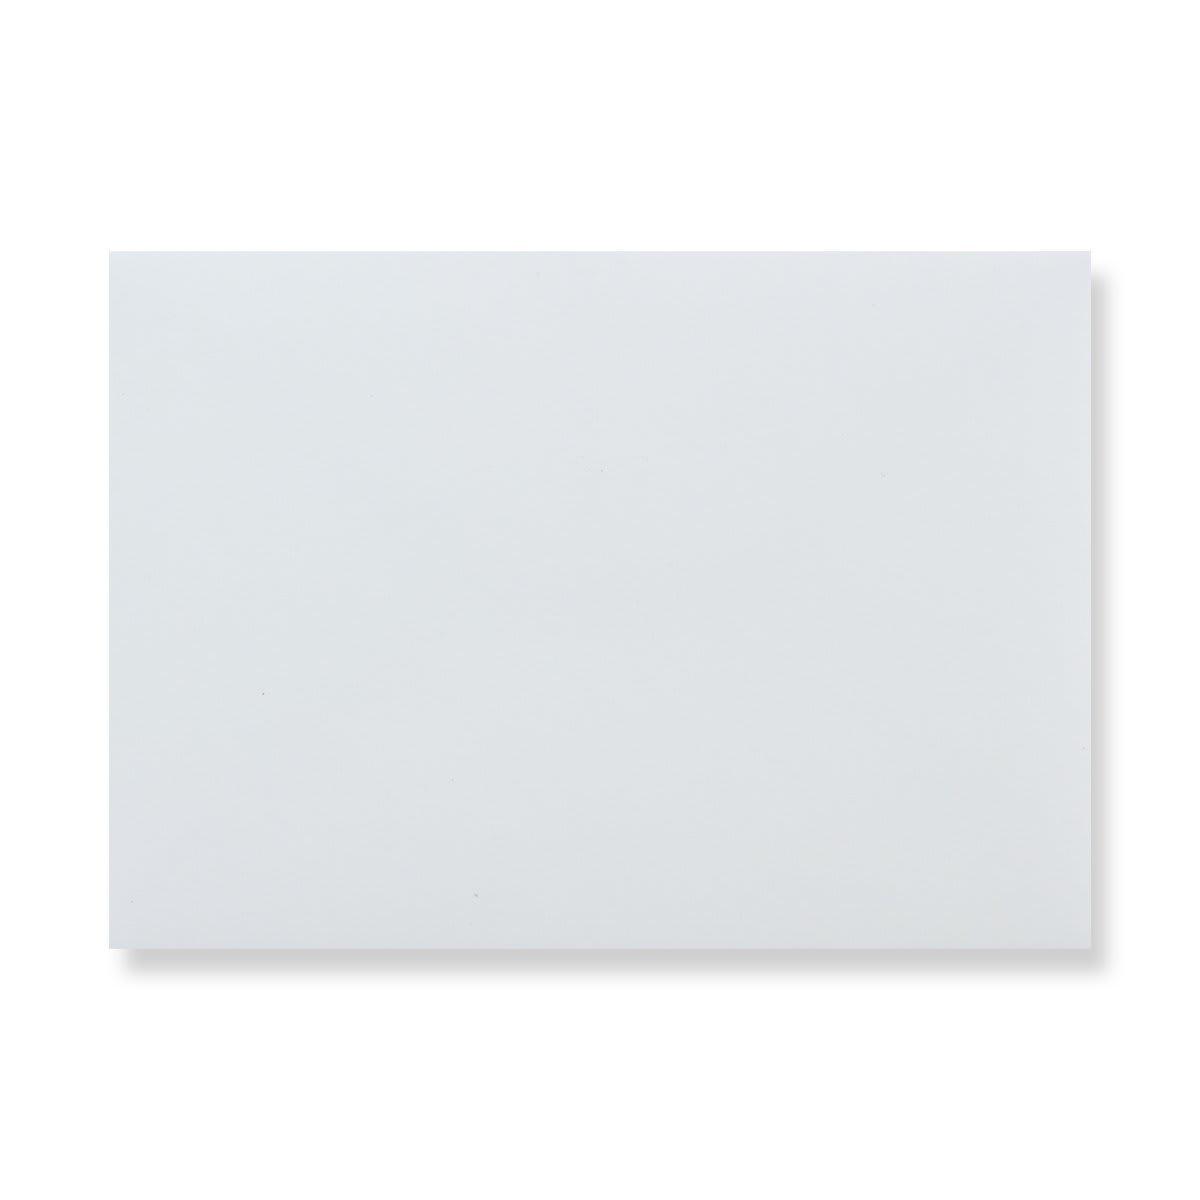 RECYCLED WHITE 125 x 175 mm ENVELOPES